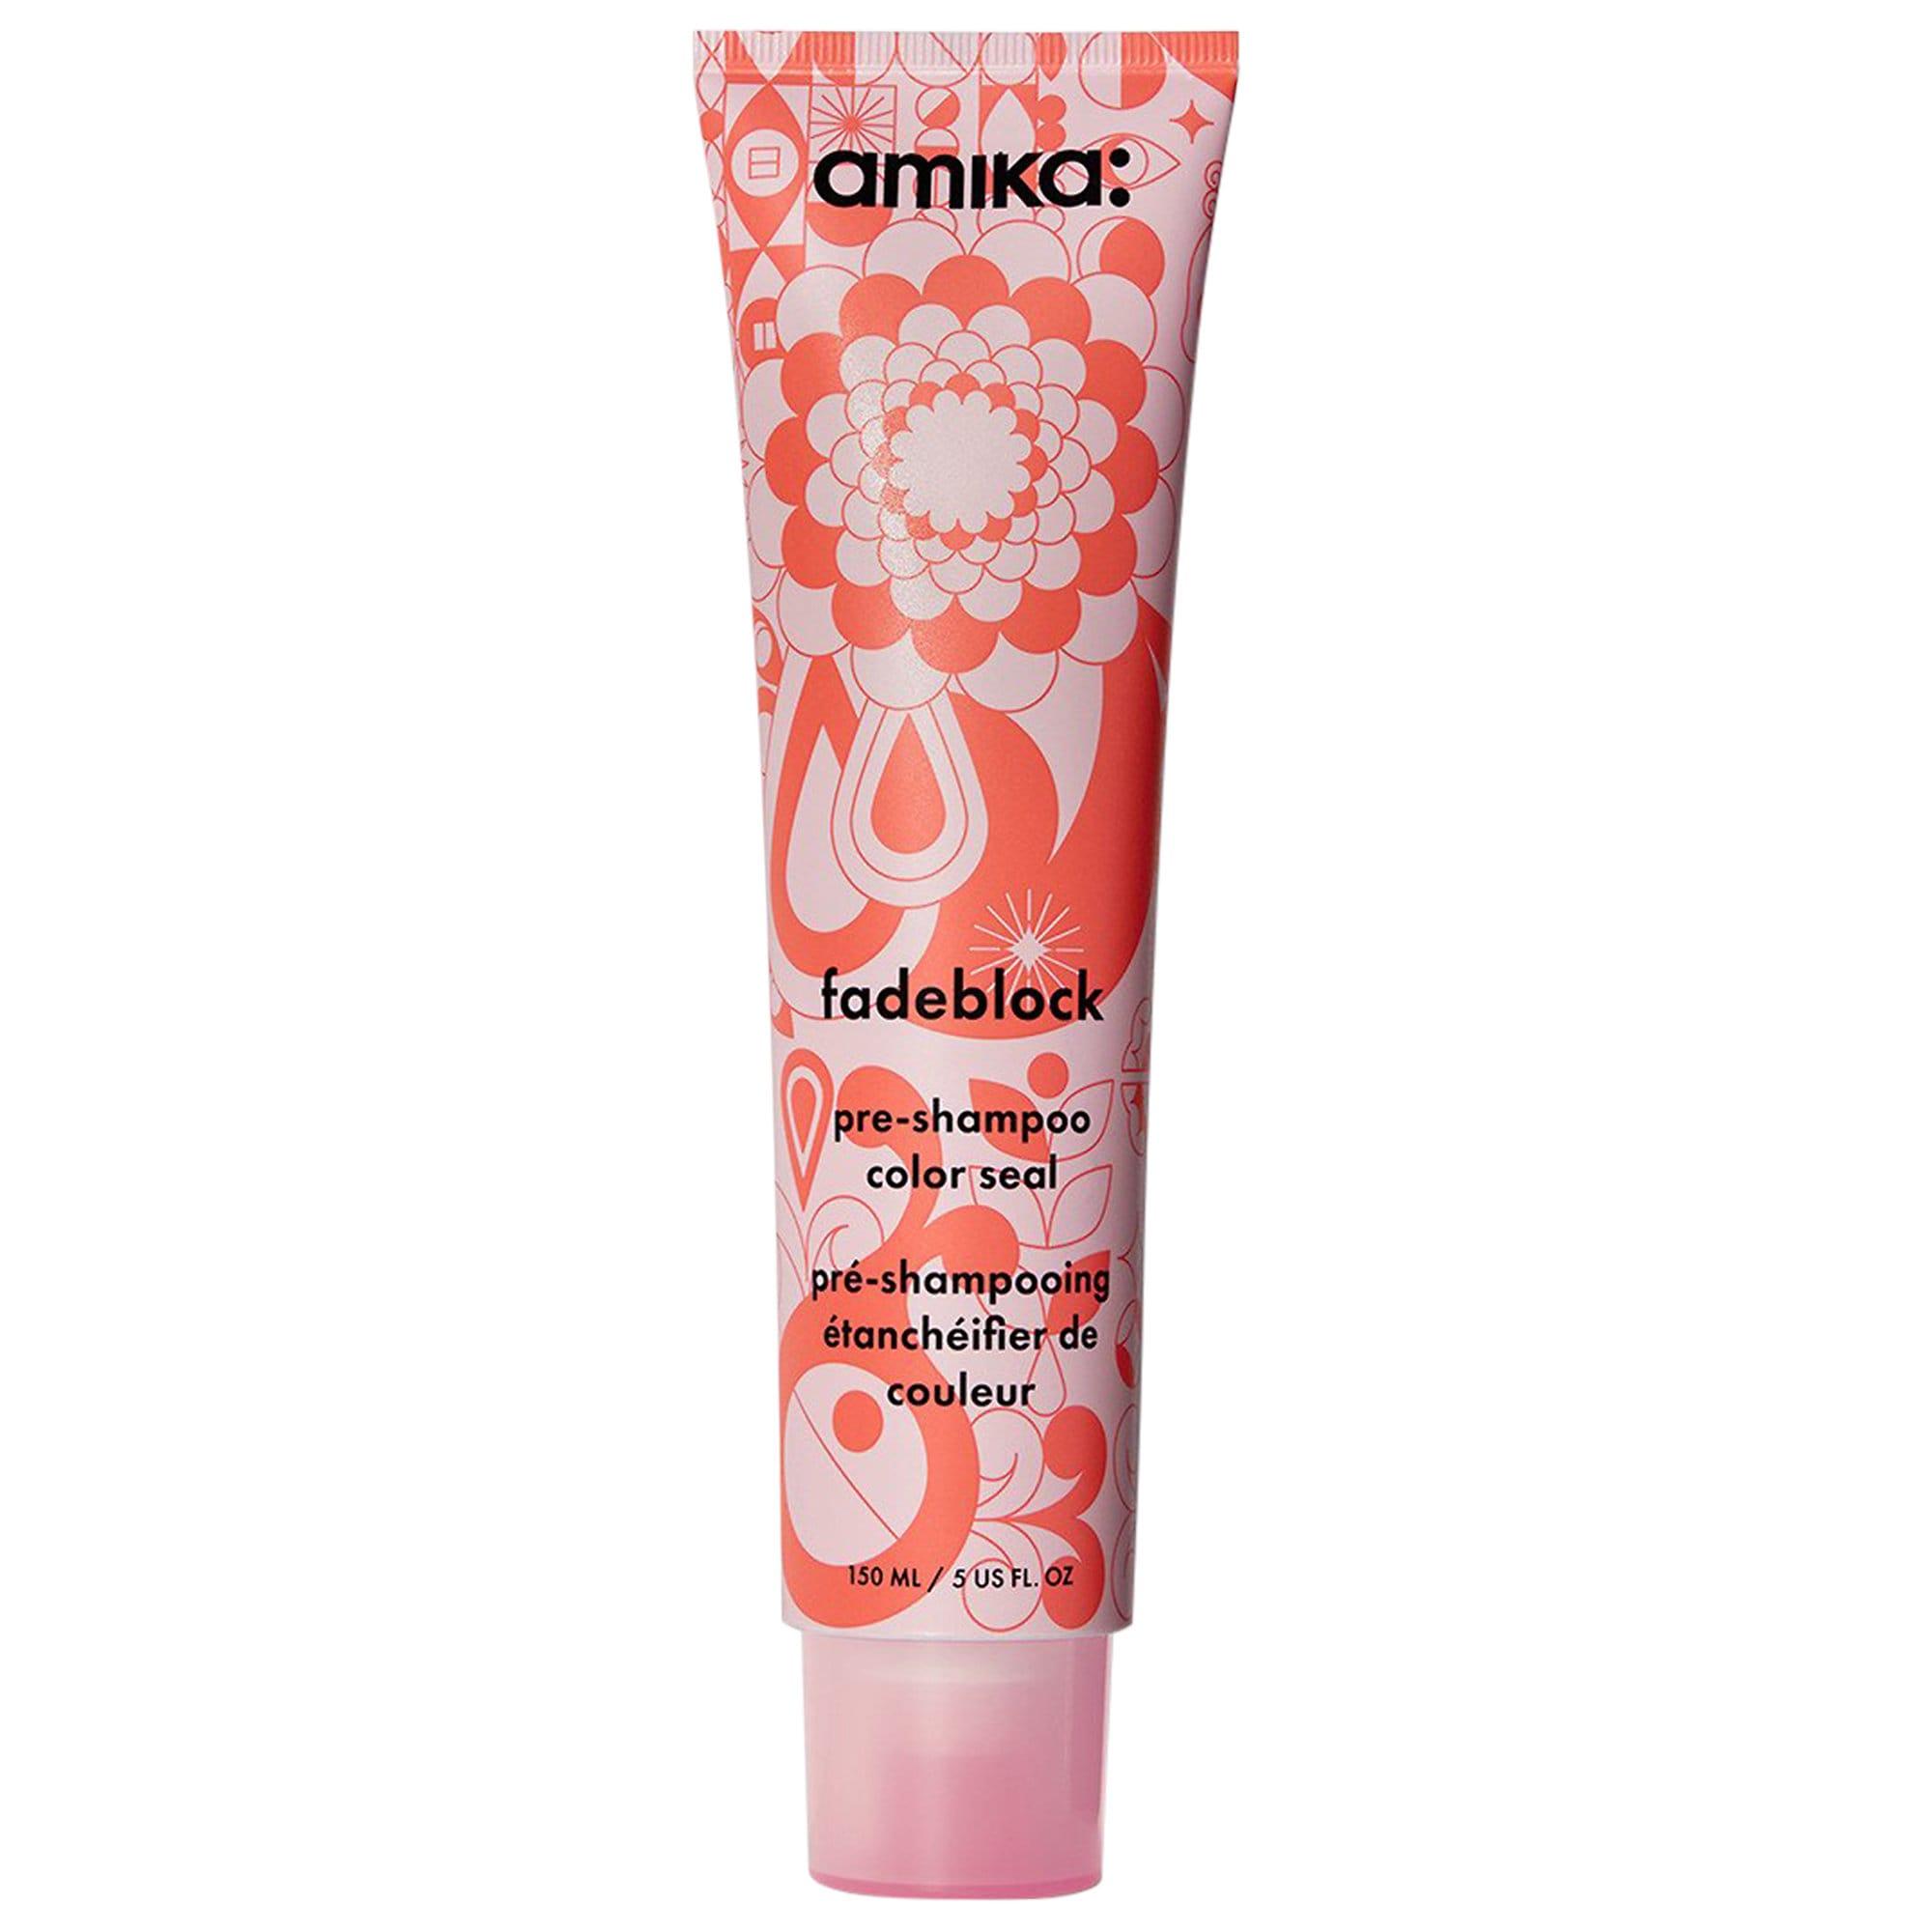 Amika - Fadeblock Pre-Shampoo Color Seal